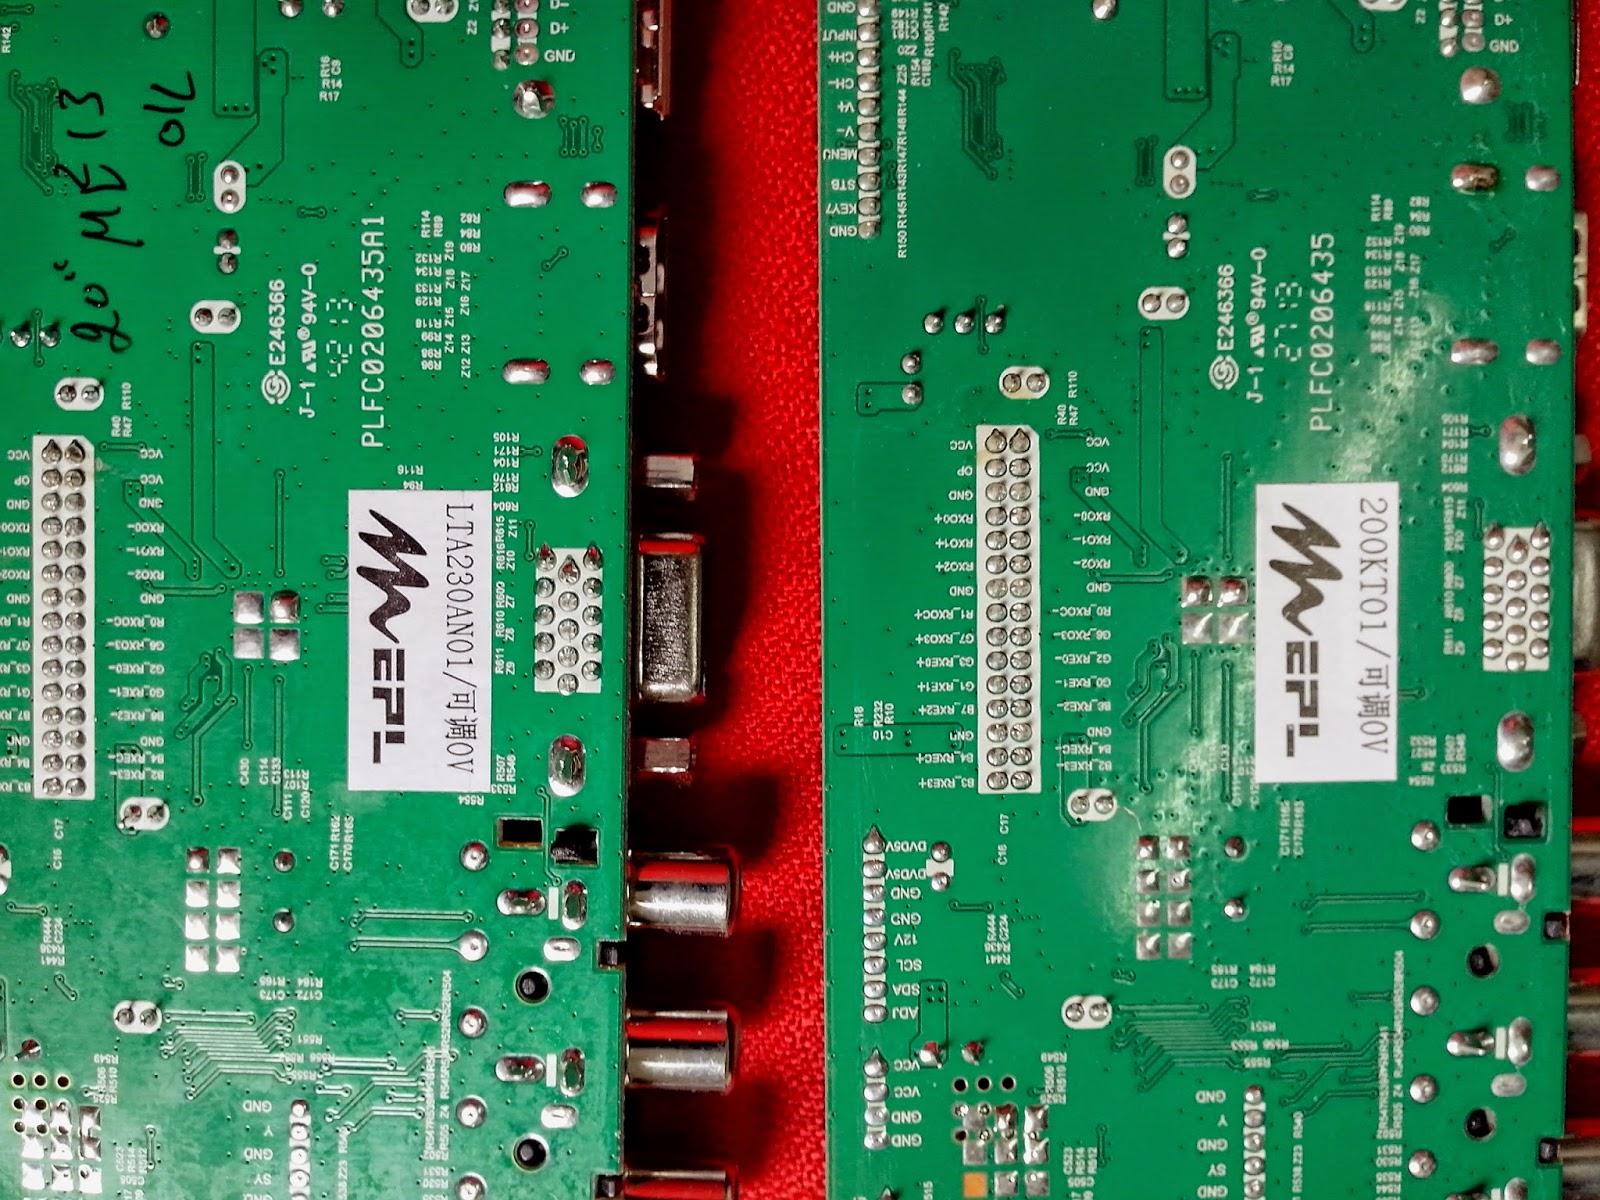 Ups Pcb Diagram Schematic Diagrams Circuit Intex Board Wiring U2022